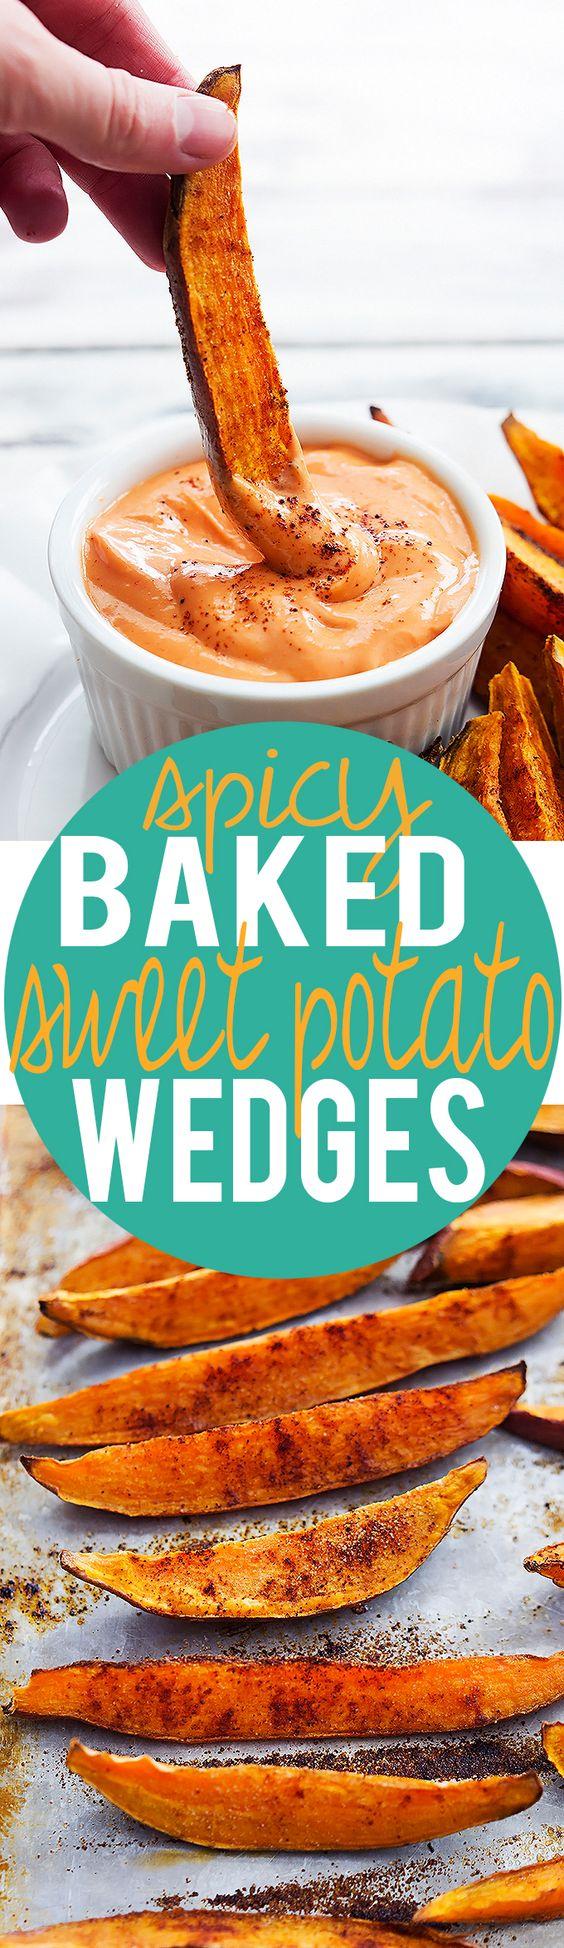 Recipe // Sweet Potato + Vegan Mayo + Sriracha + Chili Powder + Salt + Olive Oil + Garlic Powder